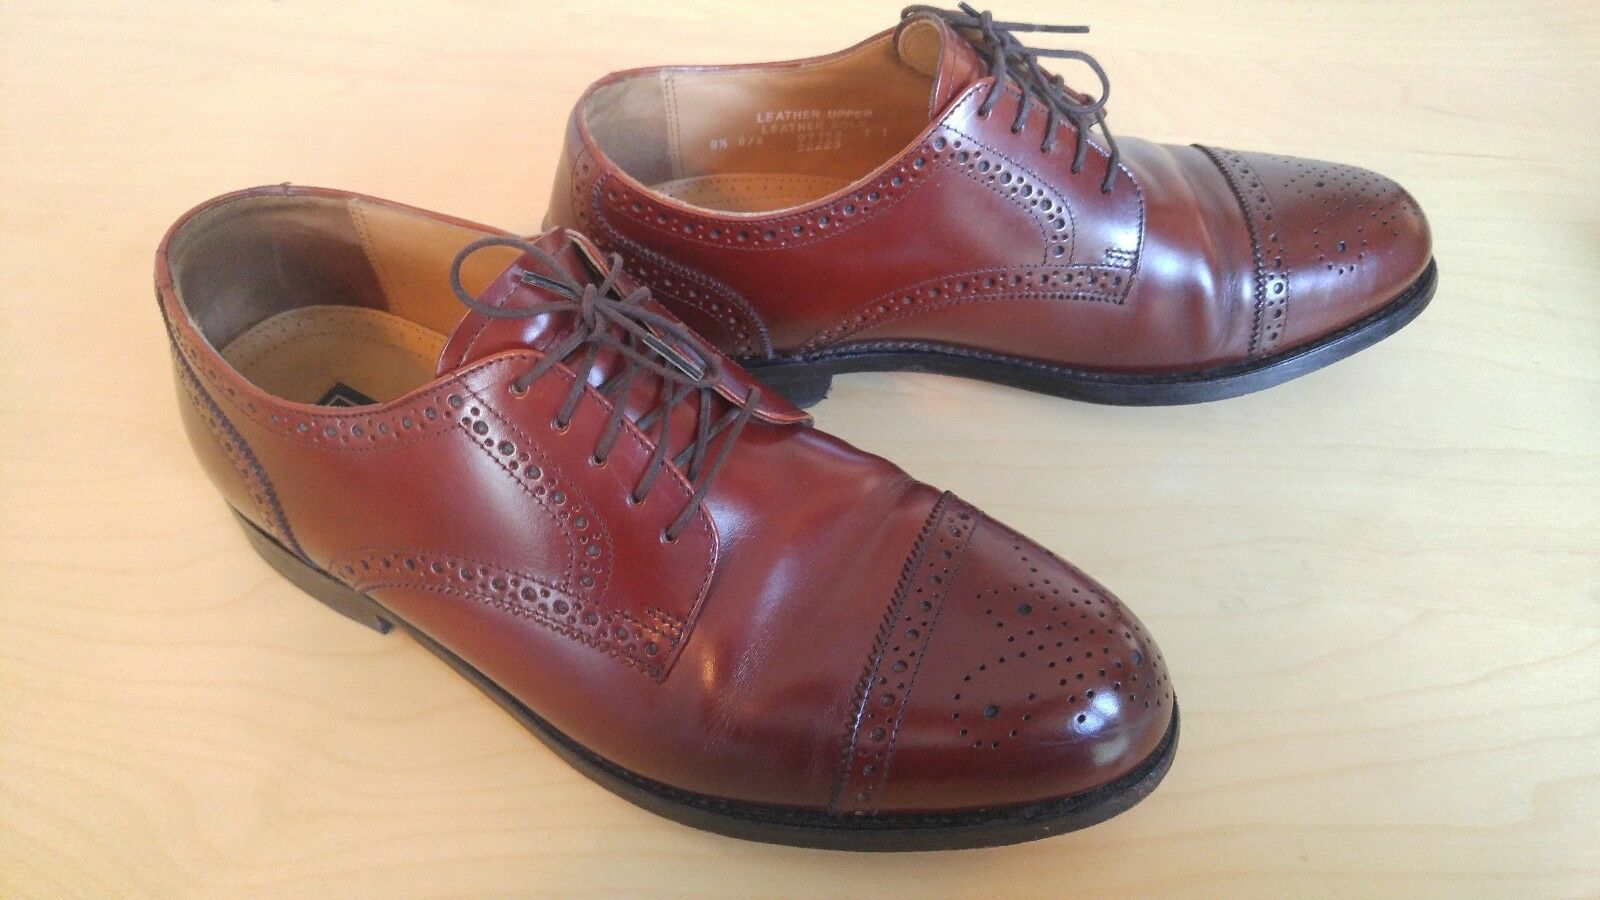 Bostonian Crown Windsor First Flex Oxford Leather Mens 1/2 Shoe - Size 9 1/2 Mens D/B c9daf5